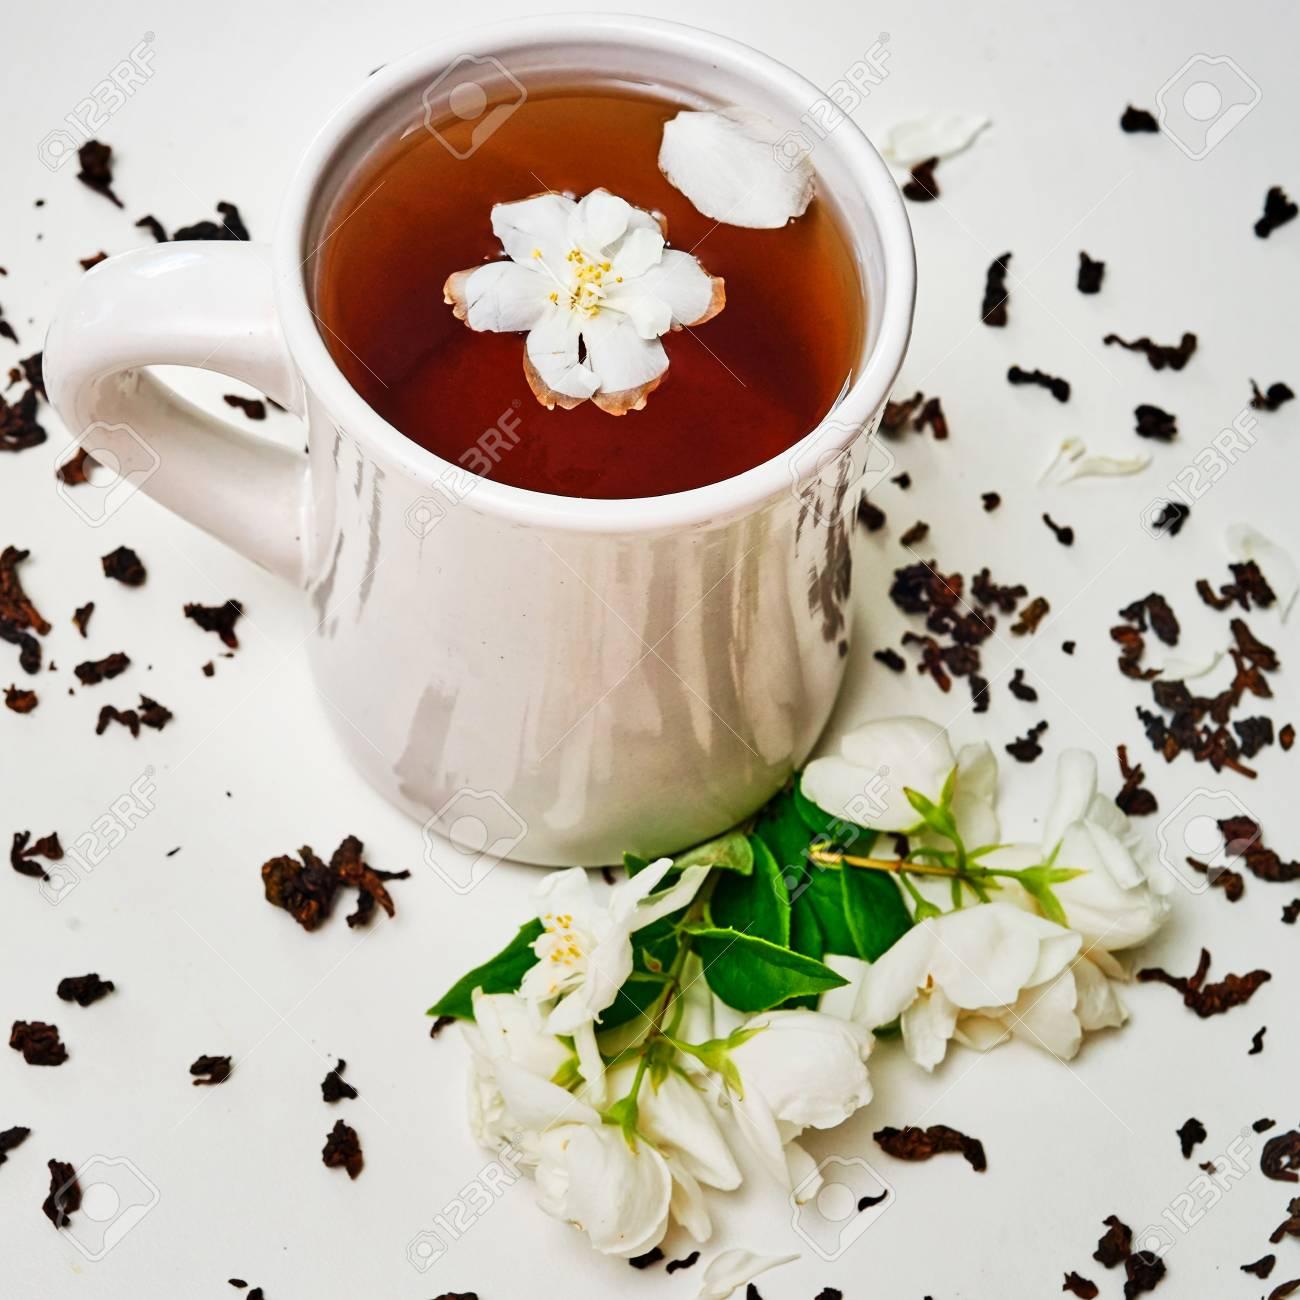 Tea Cup And Dried Jasmine Leaves And Fresh Fragrant Jasmine Flowers